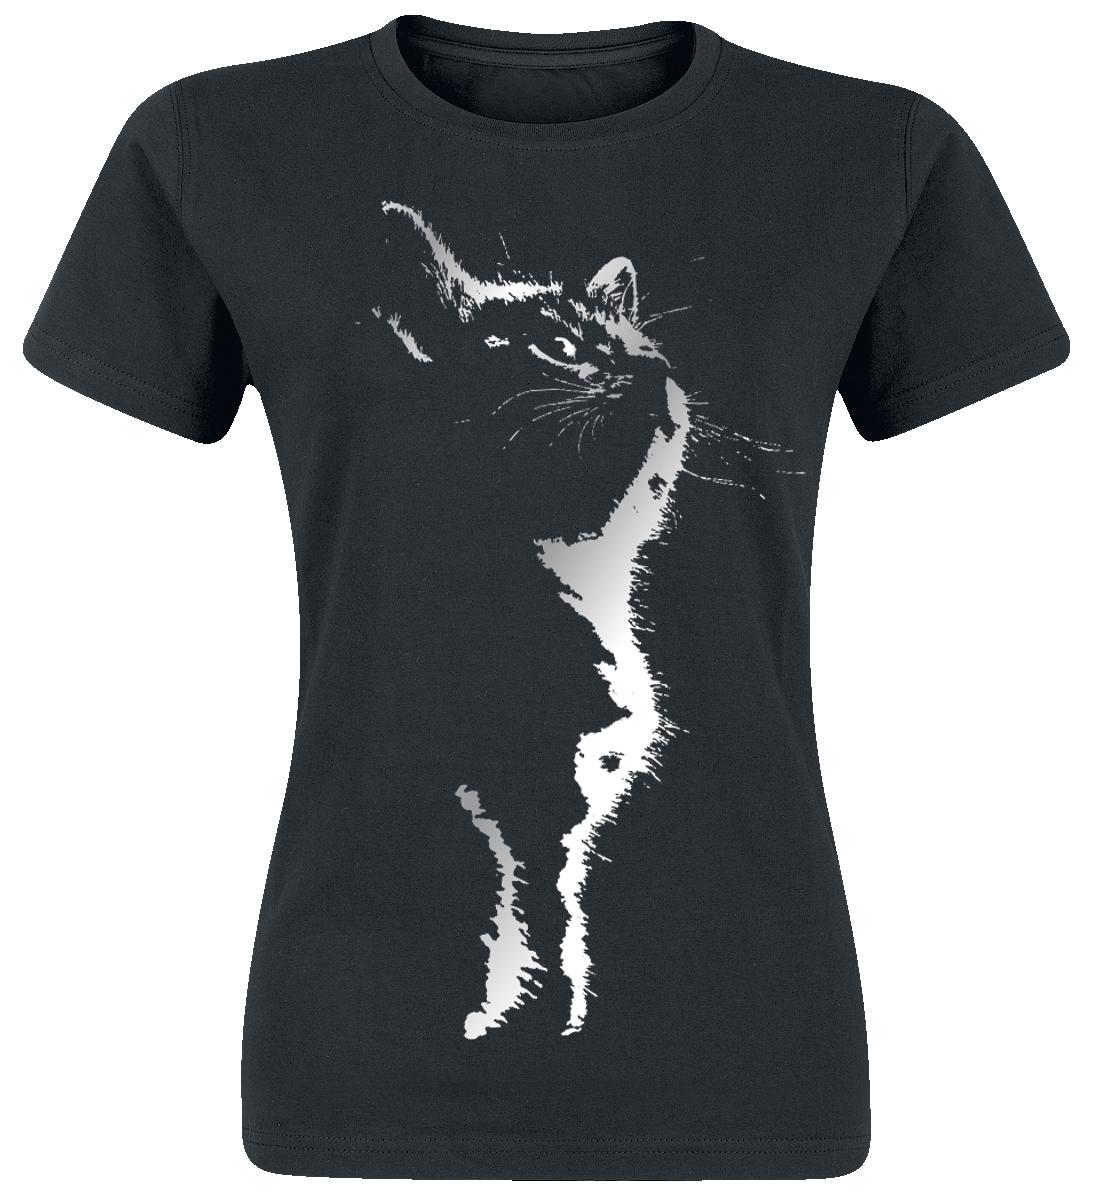 Cat Silhouette -  - Girls shirt - black image